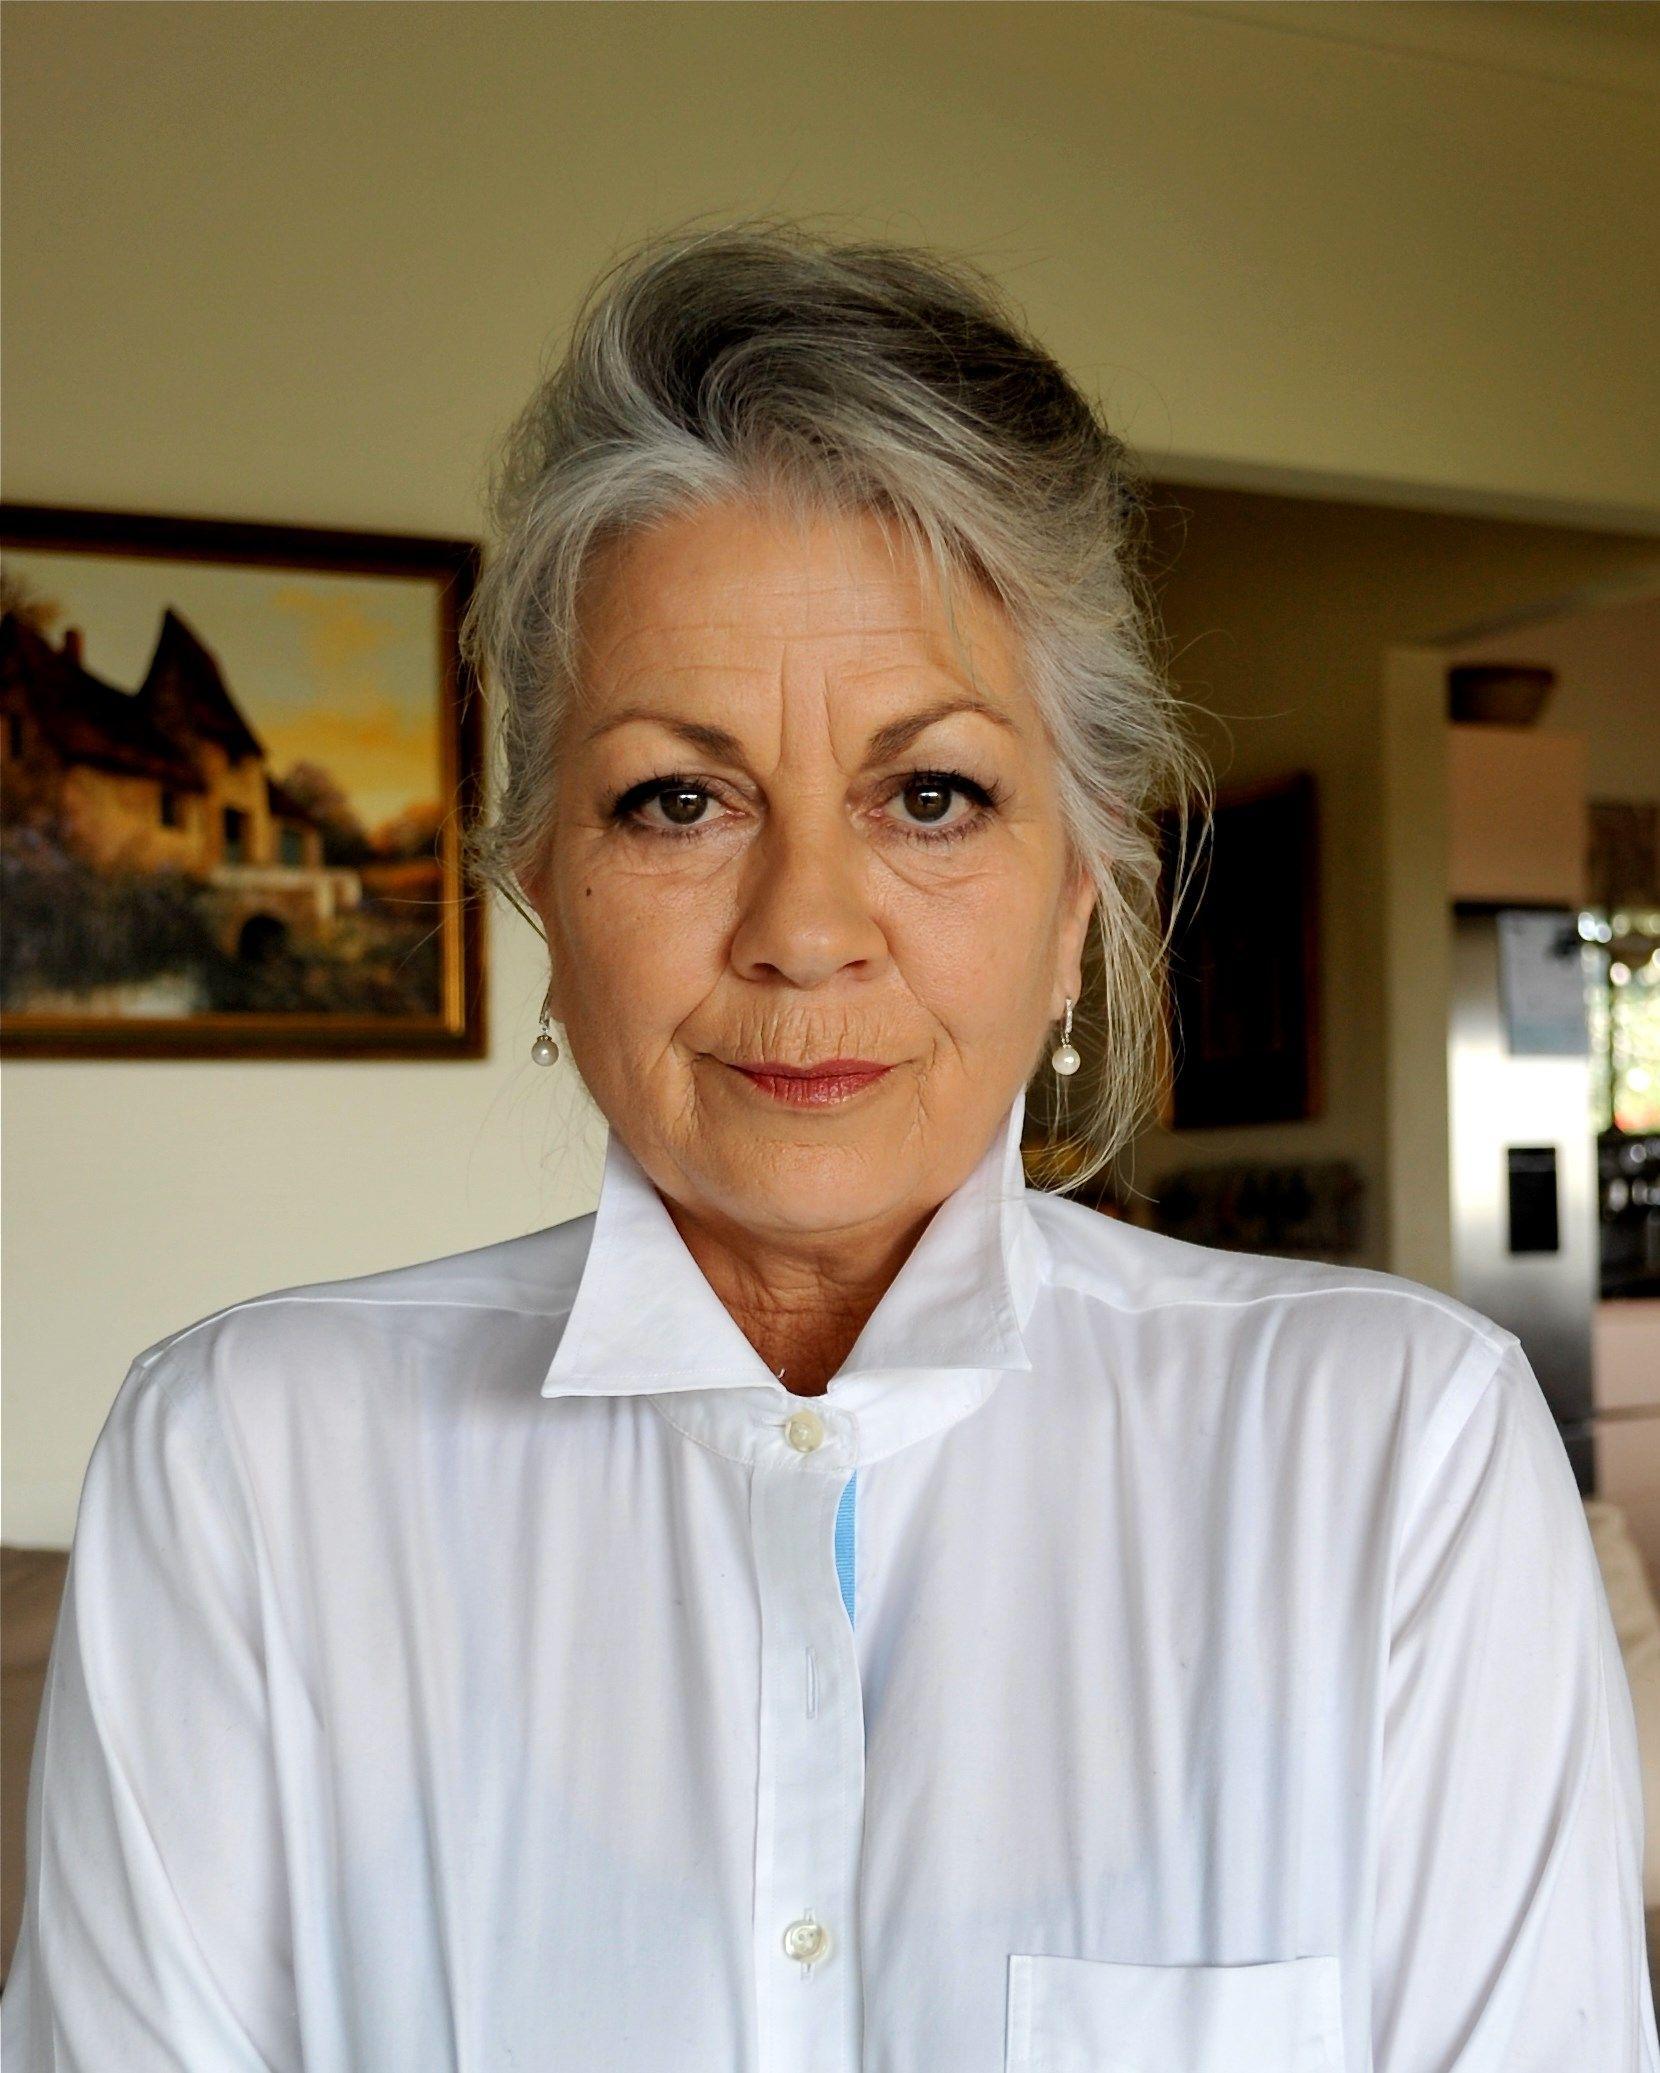 Mercia Deane-Johns Australian Actress, Writer, Singer